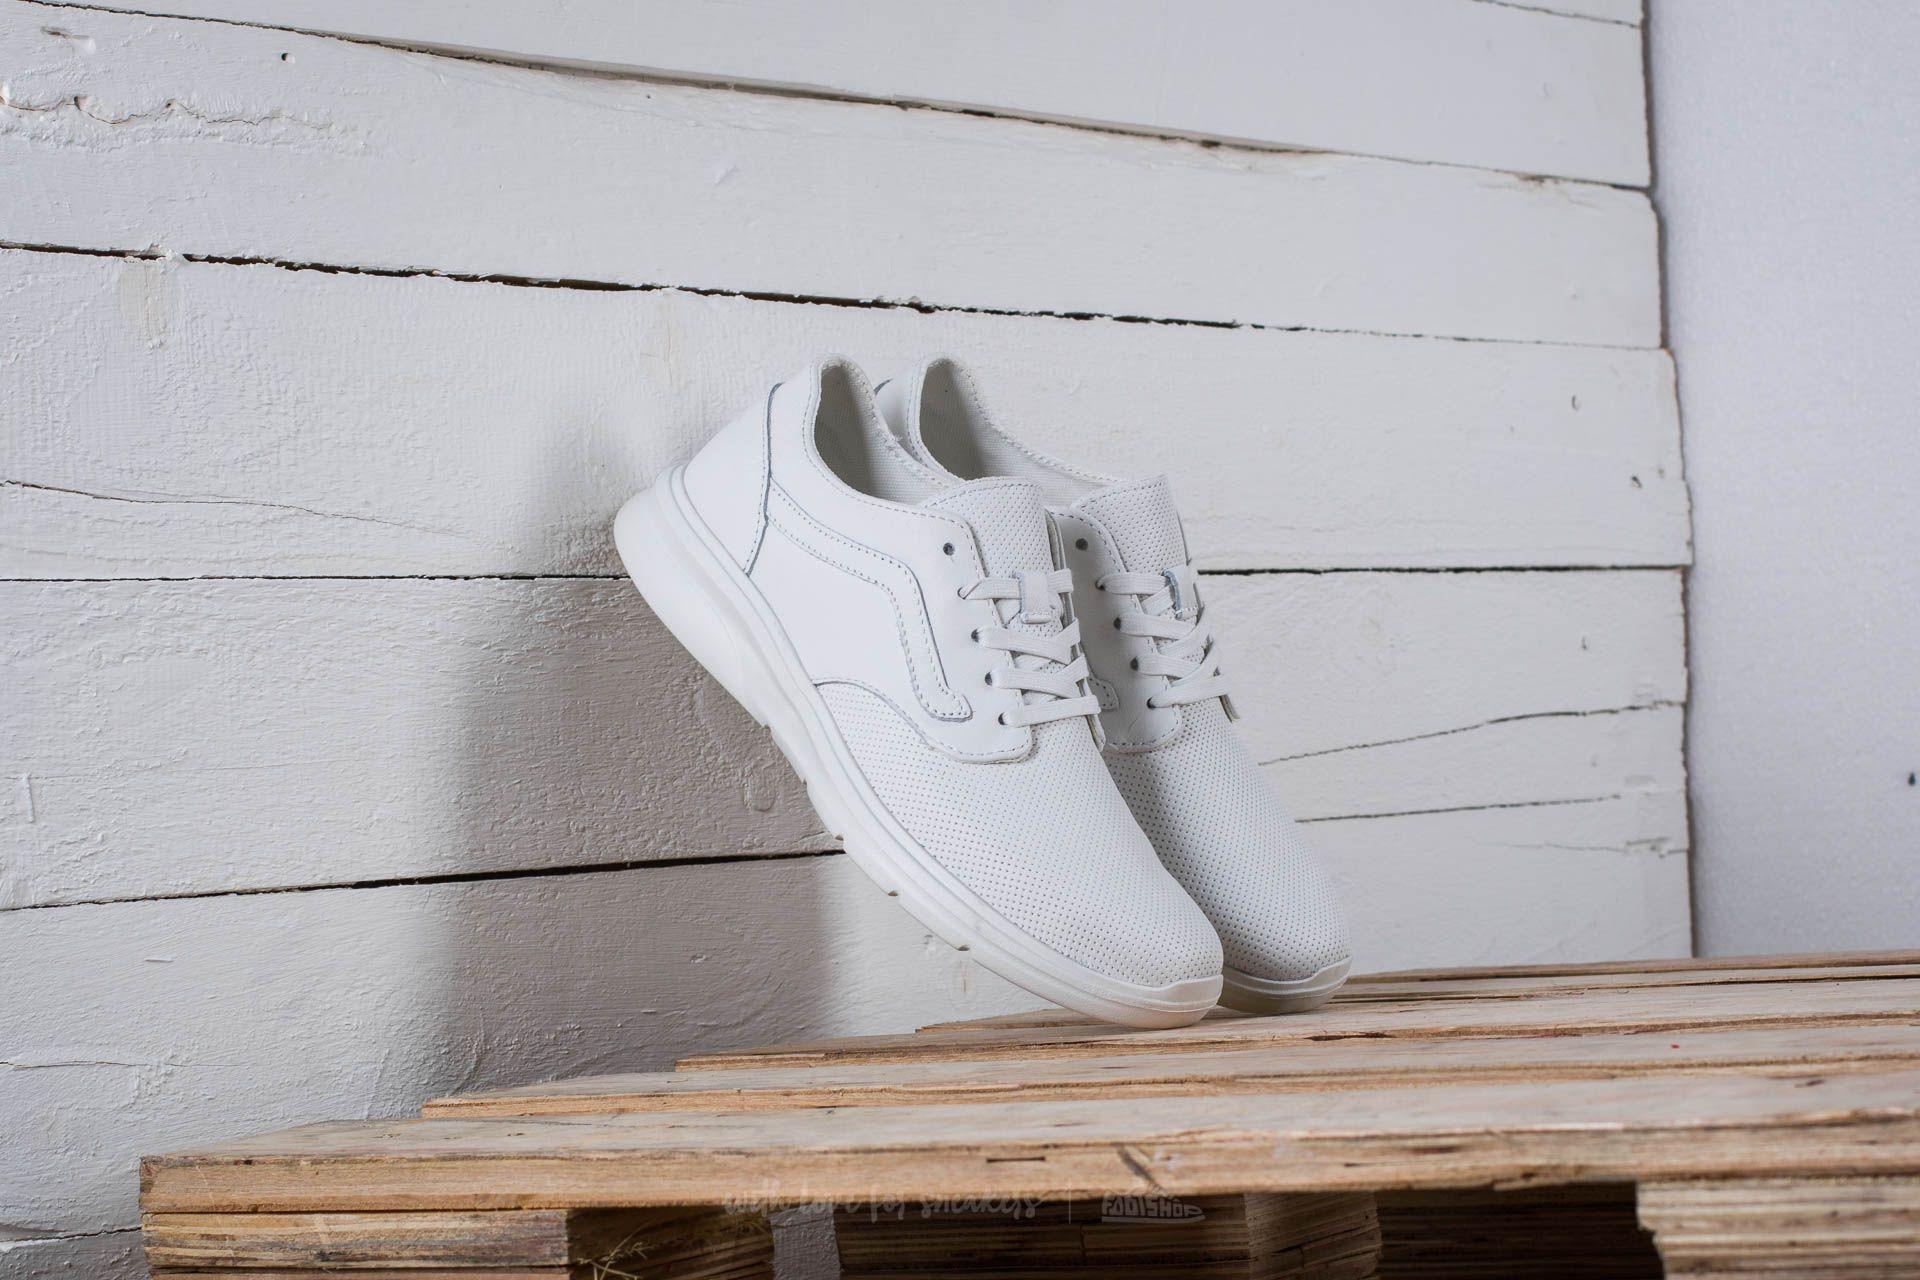 Vans Iso 2 (Square Perf) Blanc De Blanc